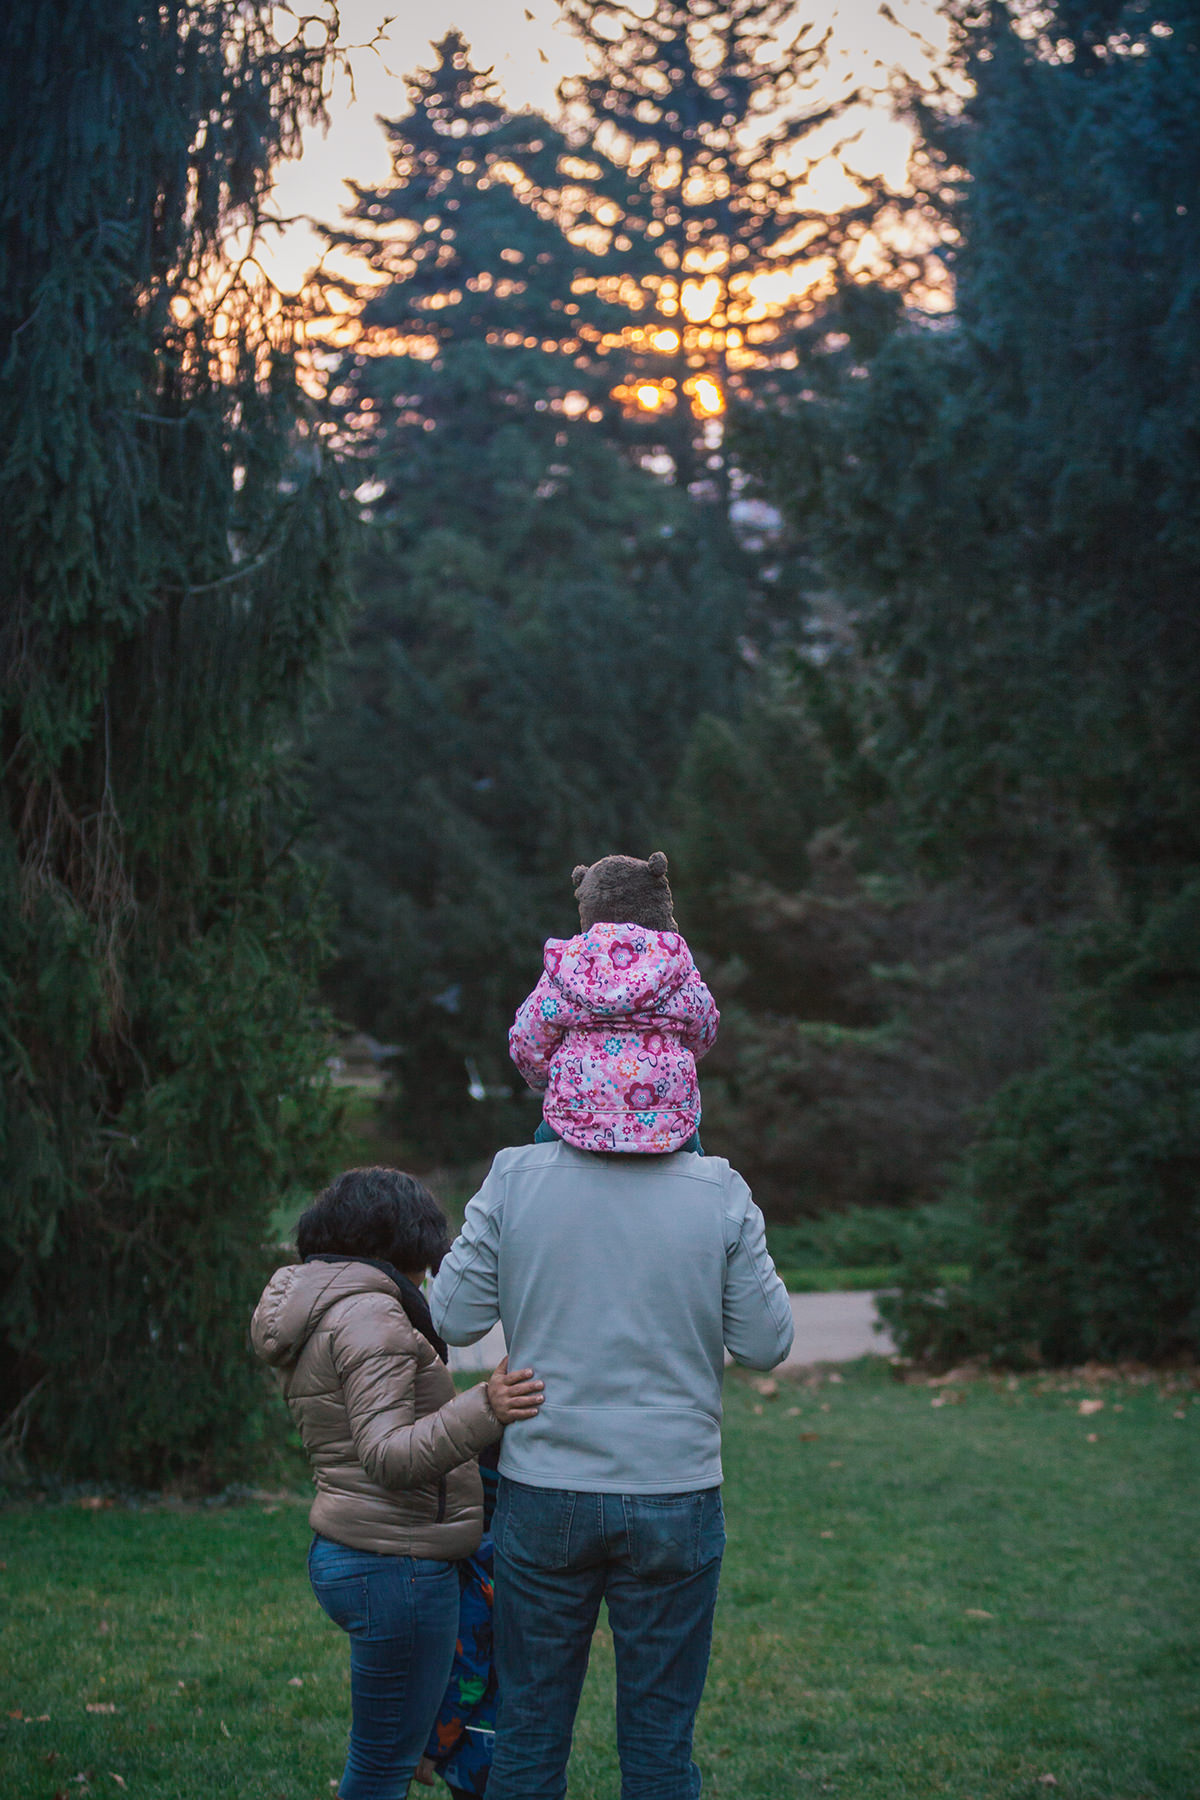 family-photography-vienna-Valery-tim-38